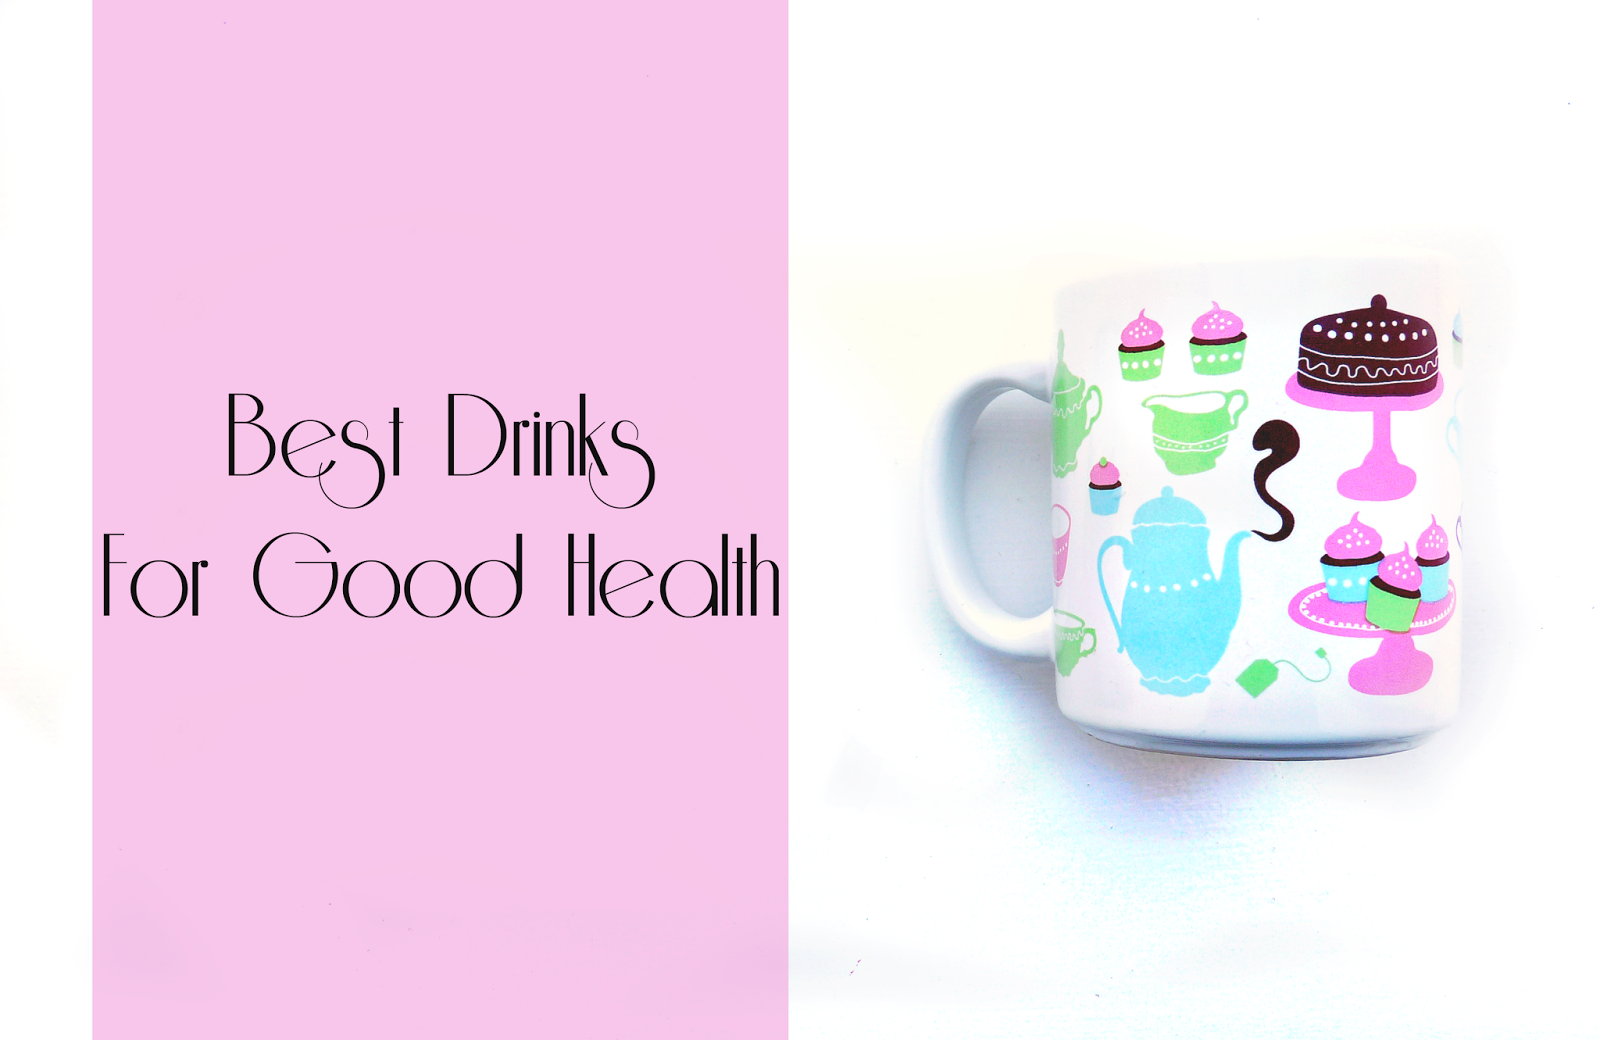 Best drinks for good health benefits of herbal tea green tea peppermint tea lemon water juicing juice green juice lifestyle healthy drinks